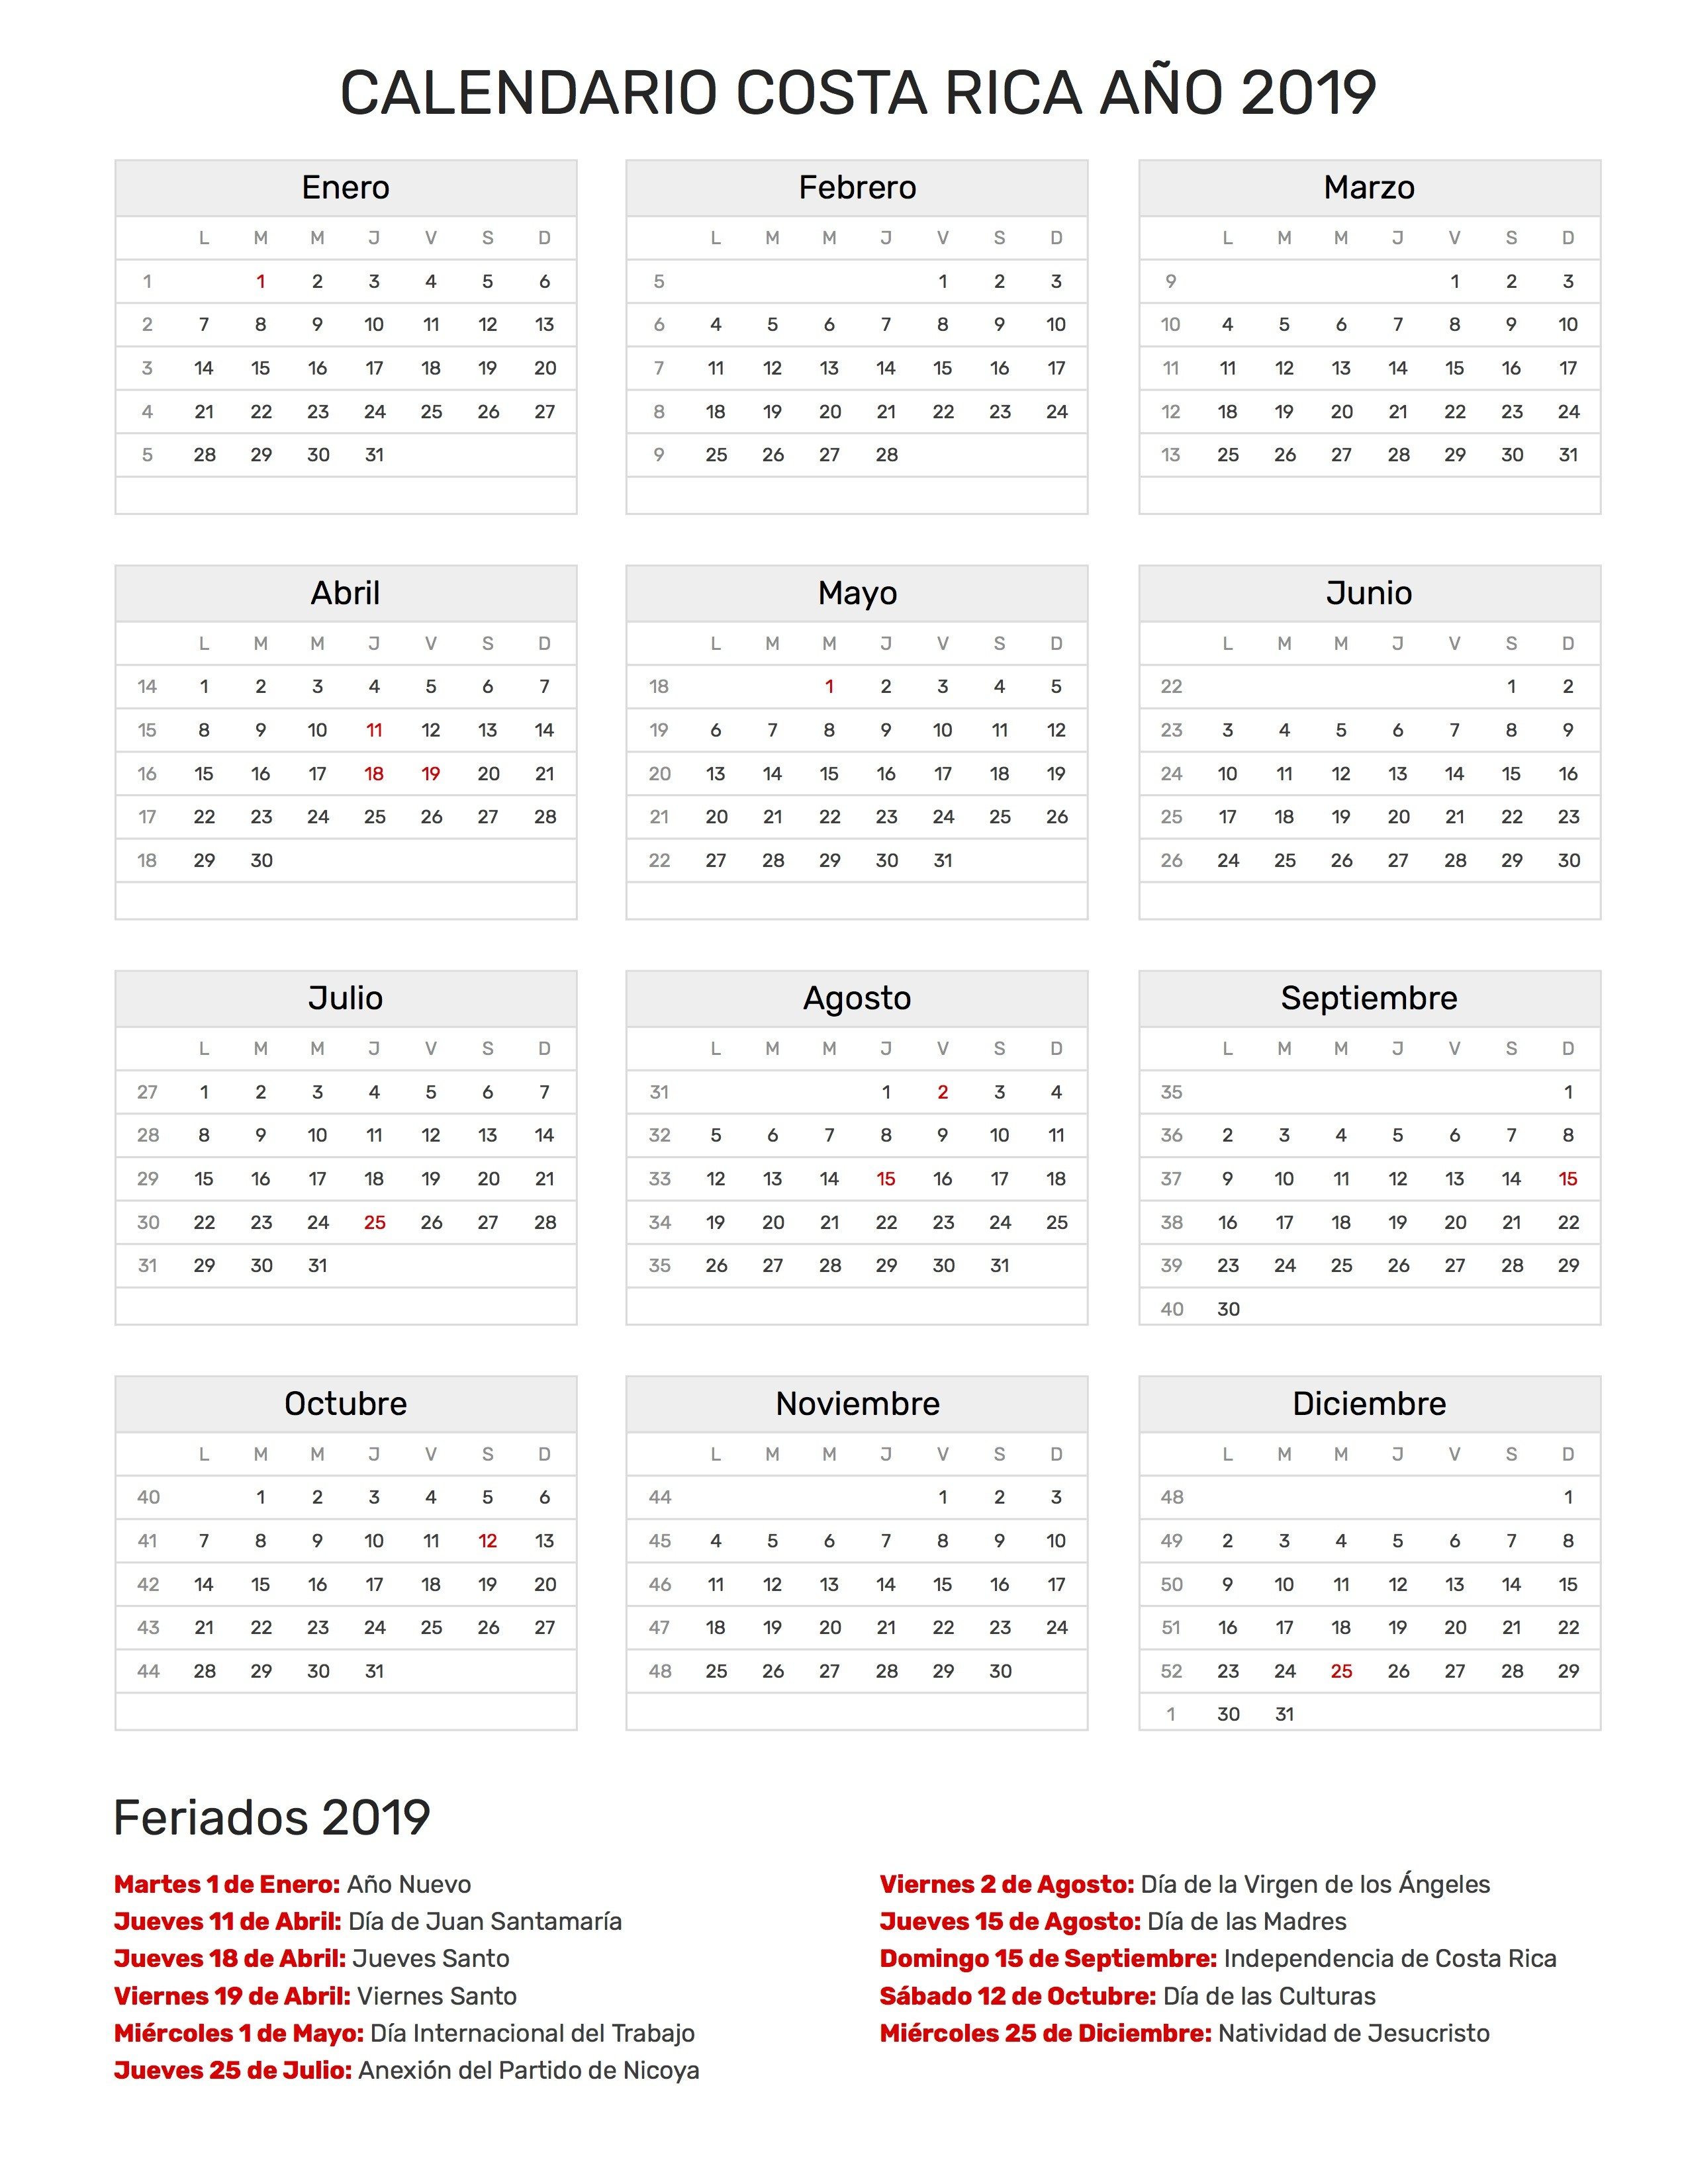 Calendario Costa Rica 2019 pdf